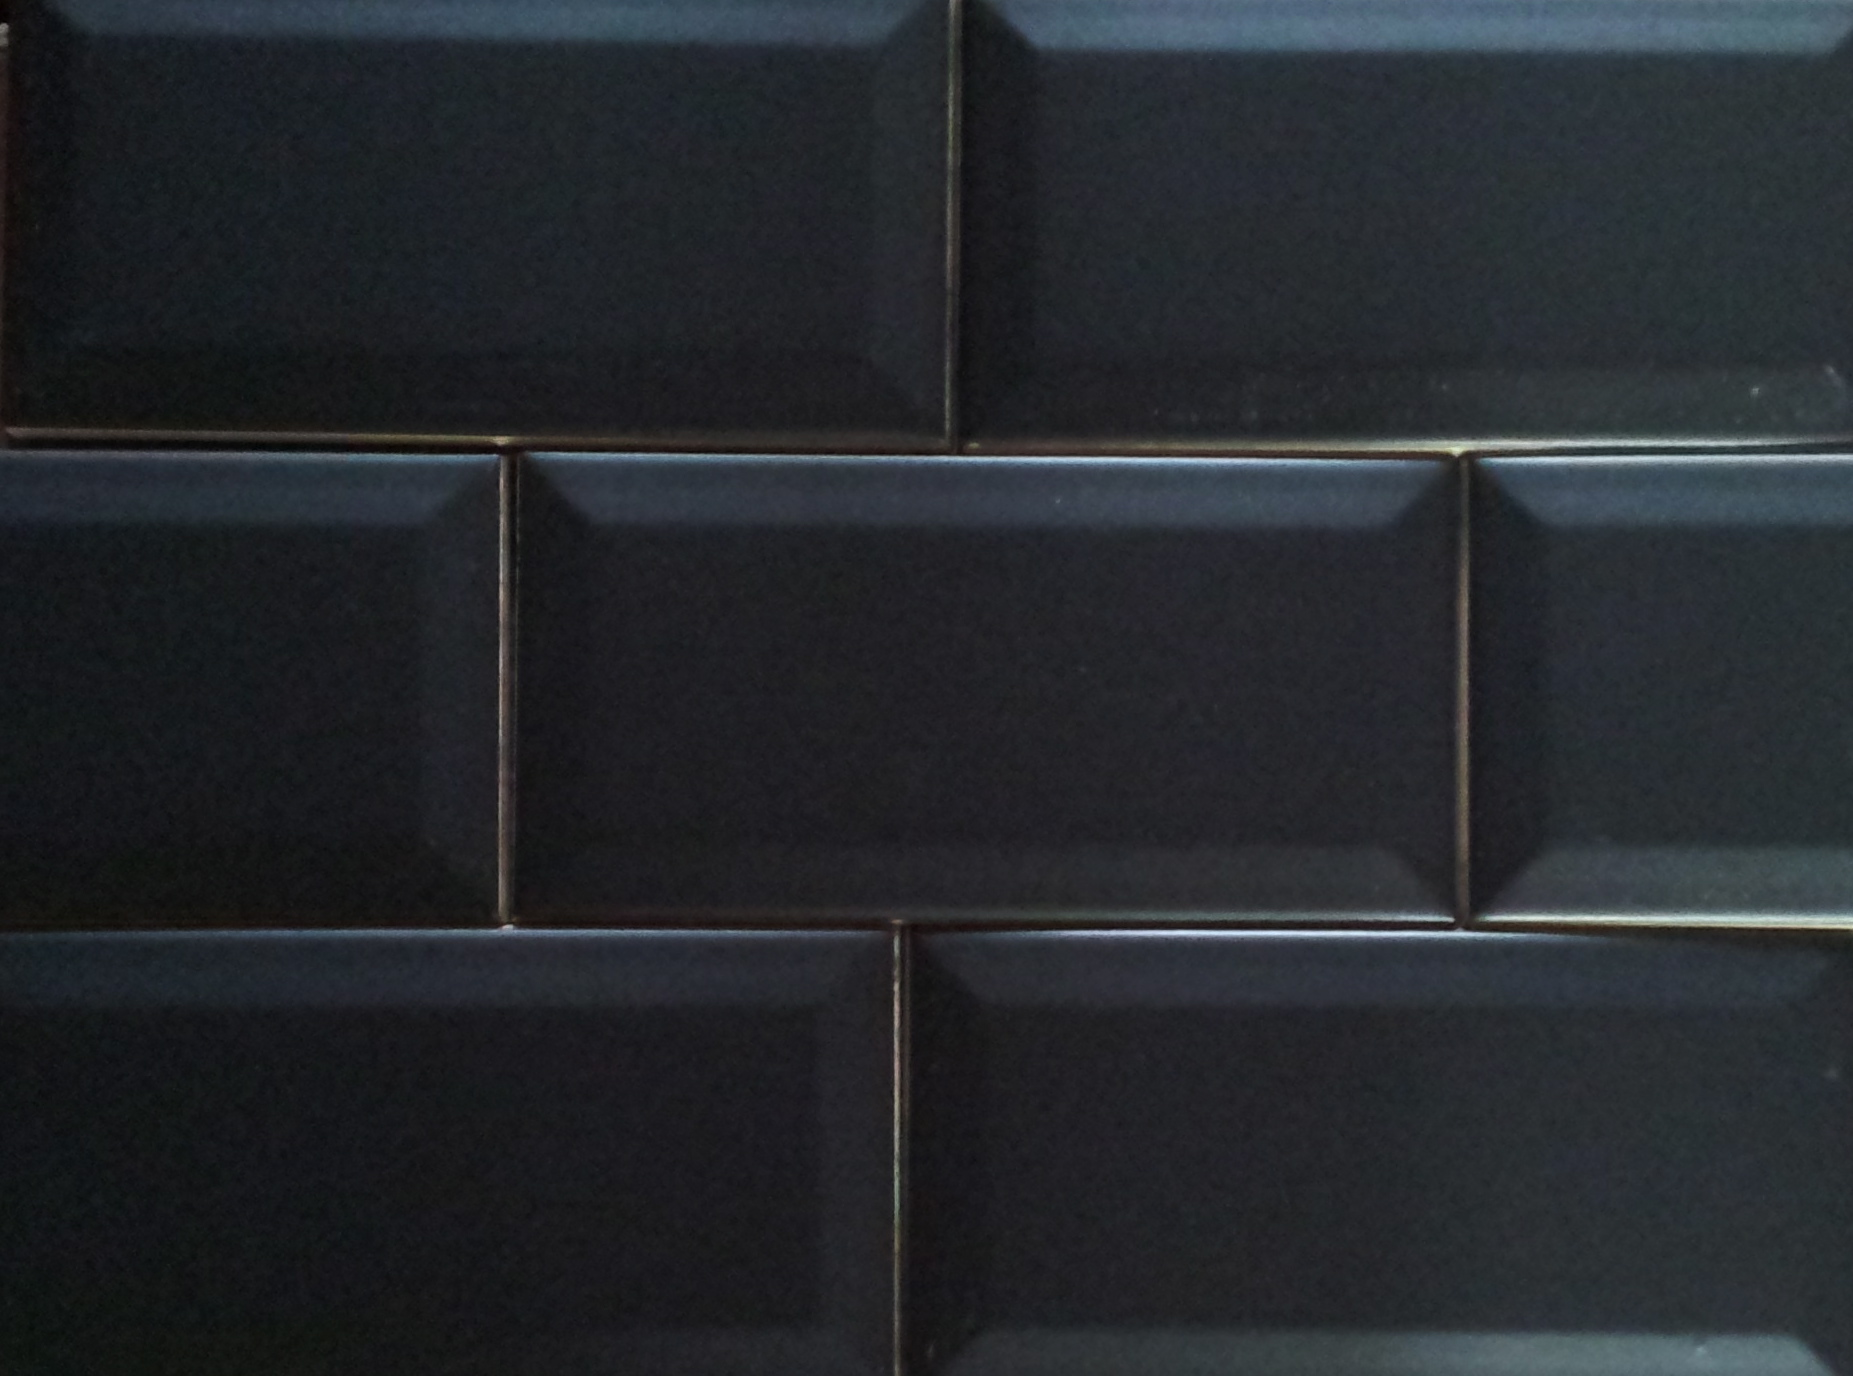 Metrotegel zwart mat 7 5 x 15 2 cm per m2 online bestellen tegelinfo - Tegel metro bordeaux ...